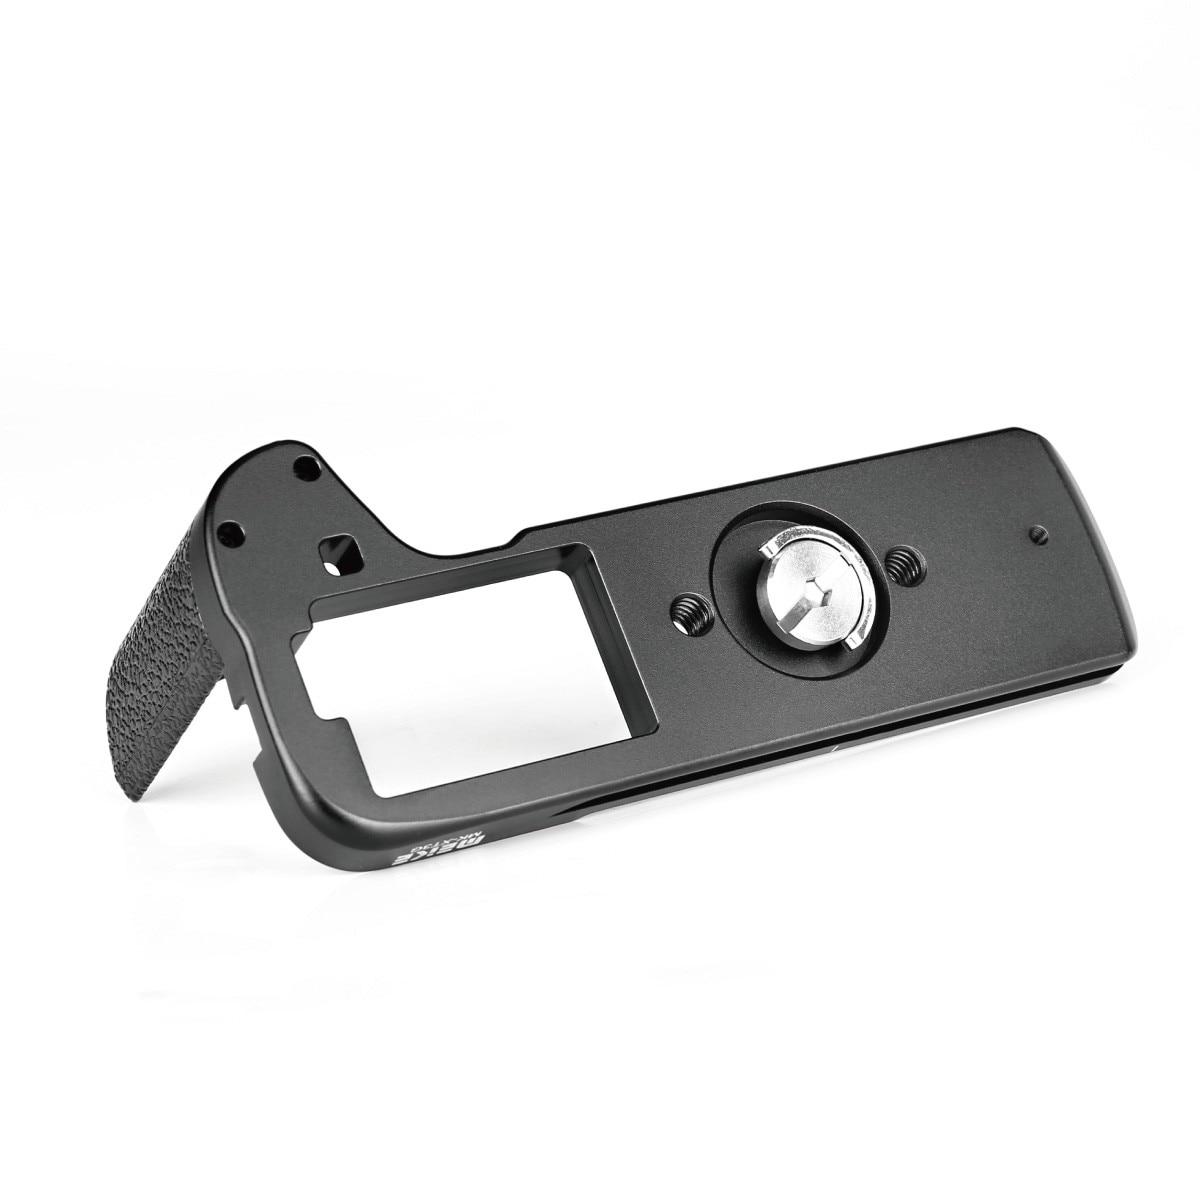 Meike MK-XT3G алюминиевый сплав рукоятка Quick Release Plate L кронштейн для Fujifilm Fuji X-T3 XT3 камера как MHG-XT3